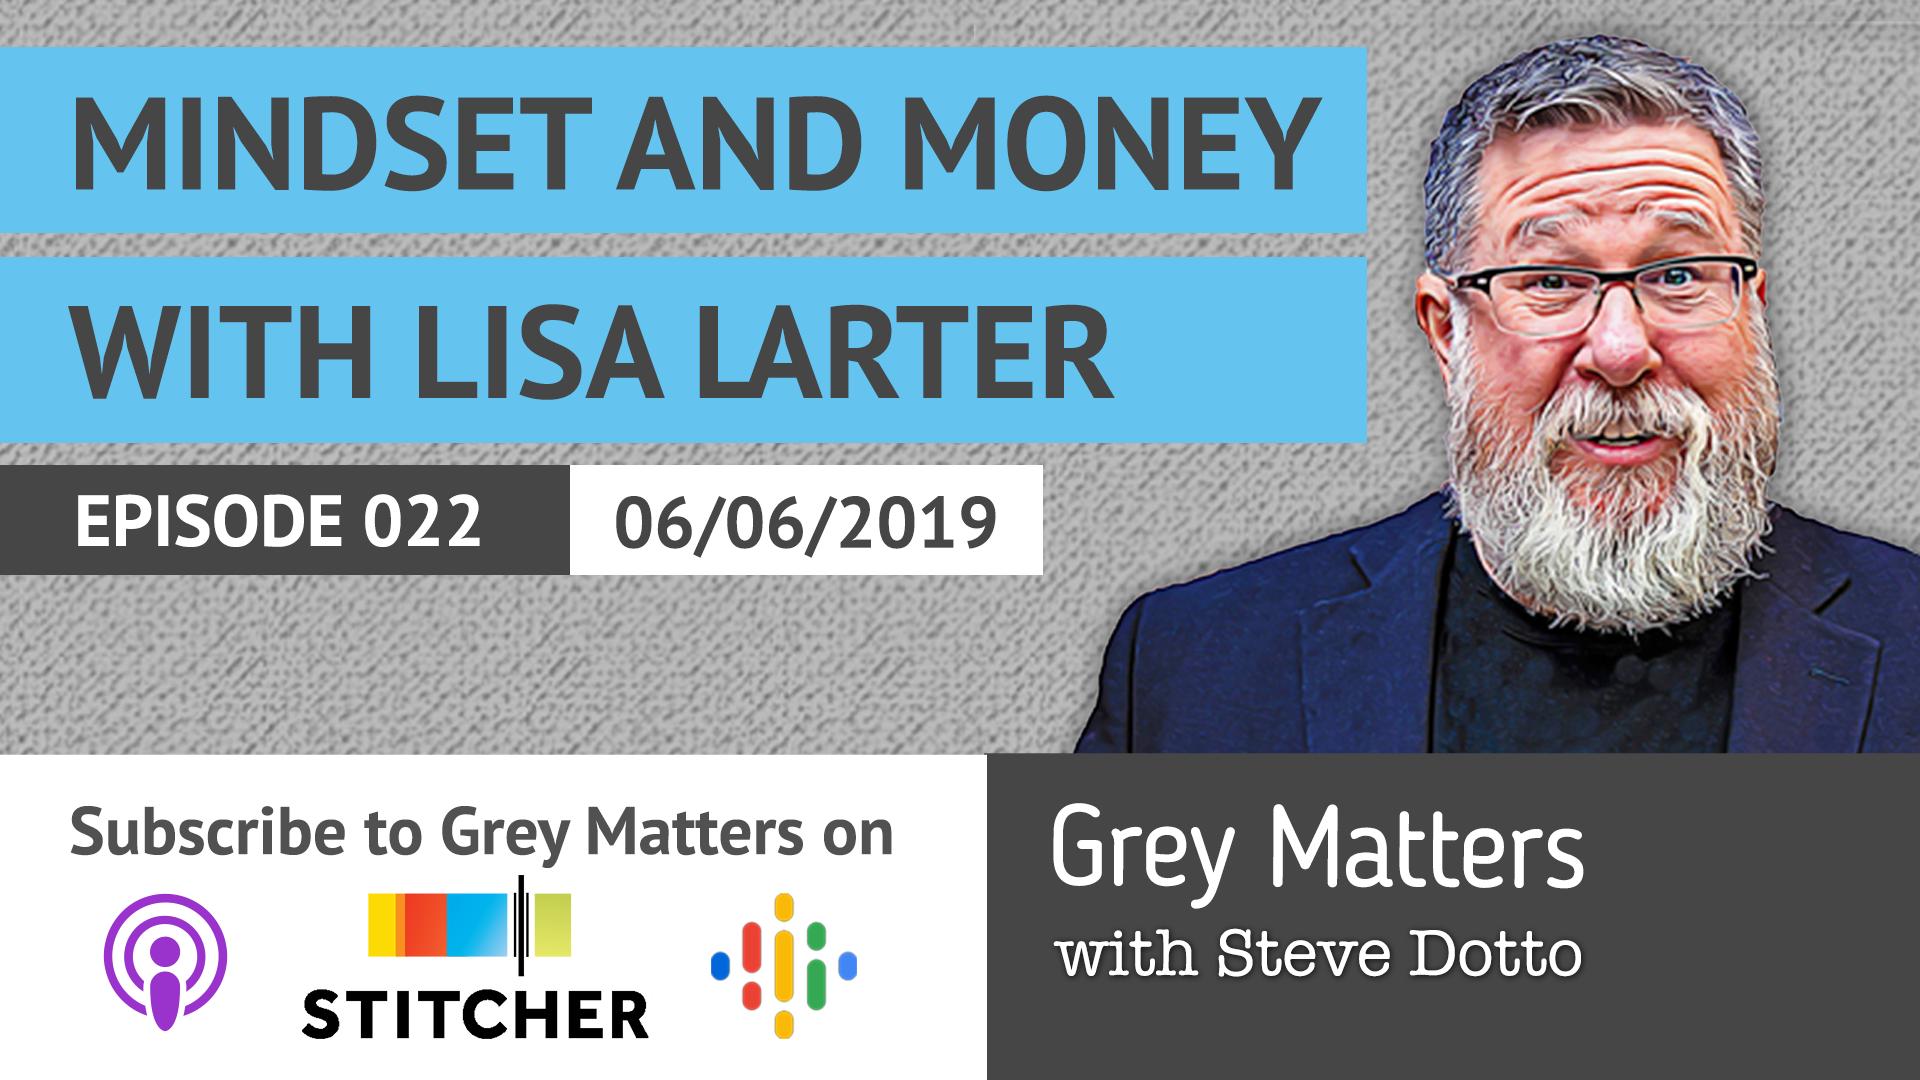 Mindset and Money, with Lisa Larter